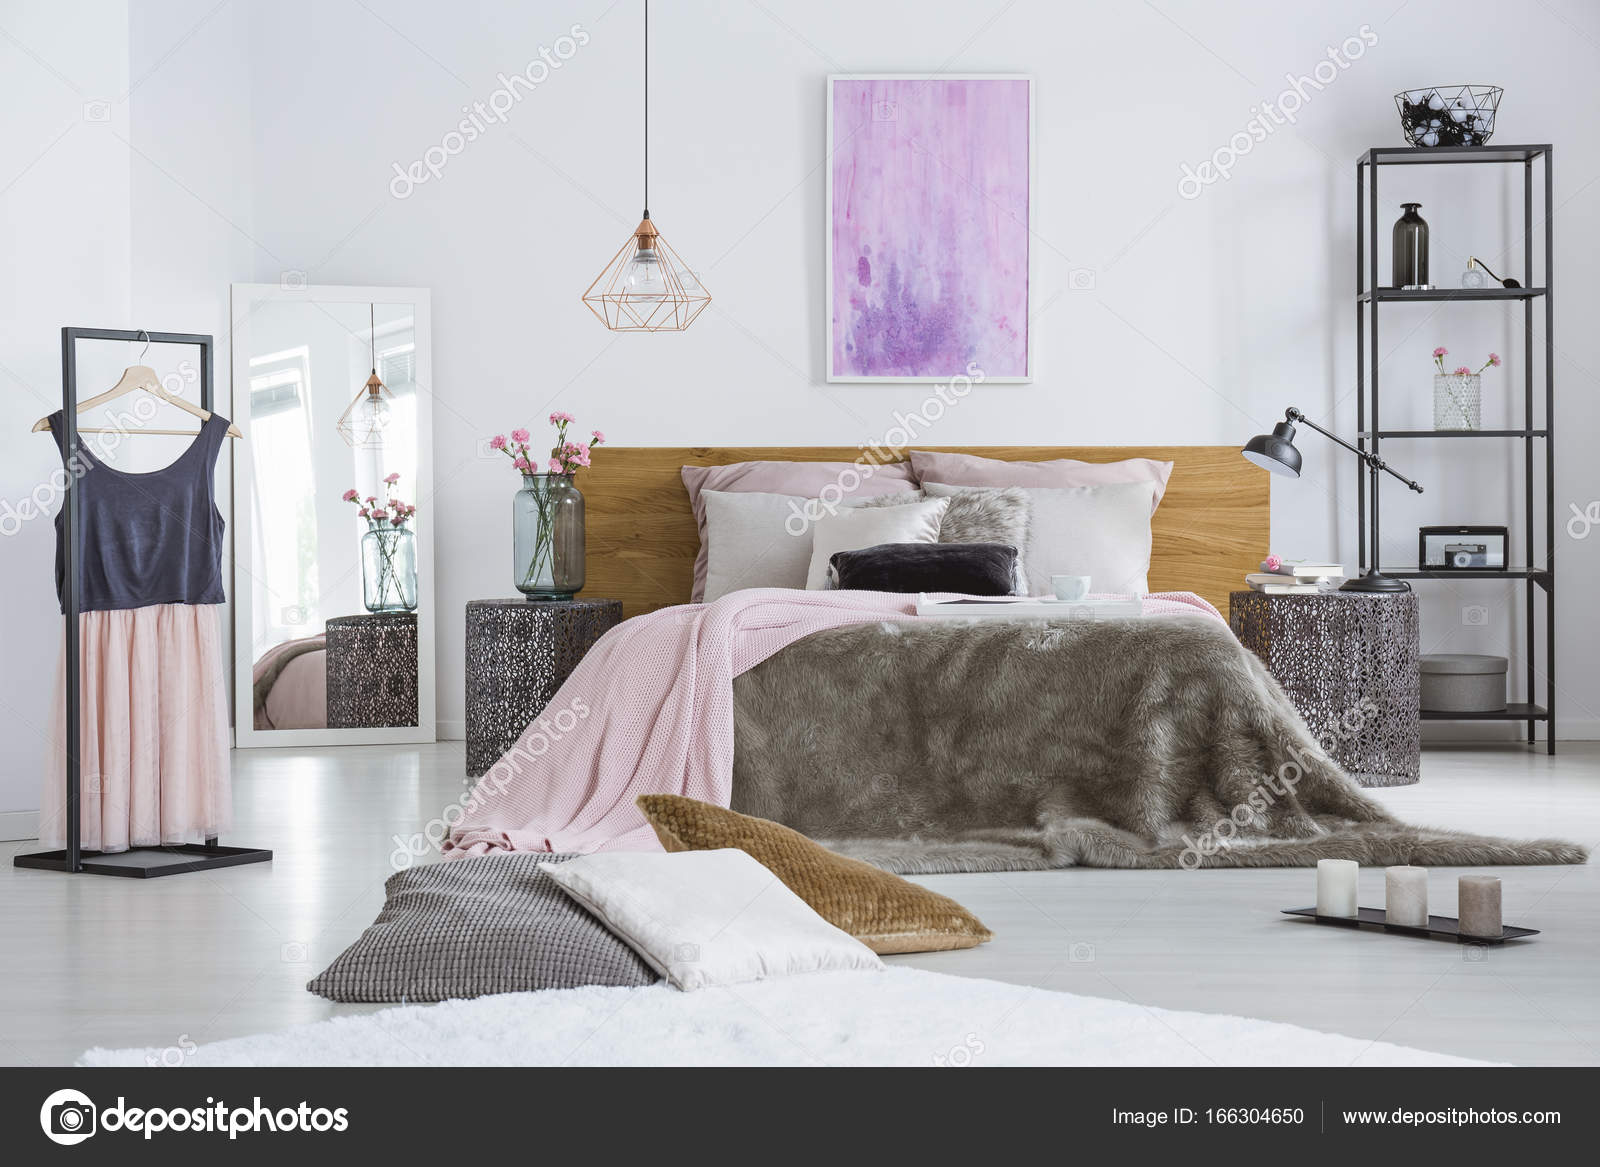 Trapunta piumone penelope letto matrimoniale invernale elegante